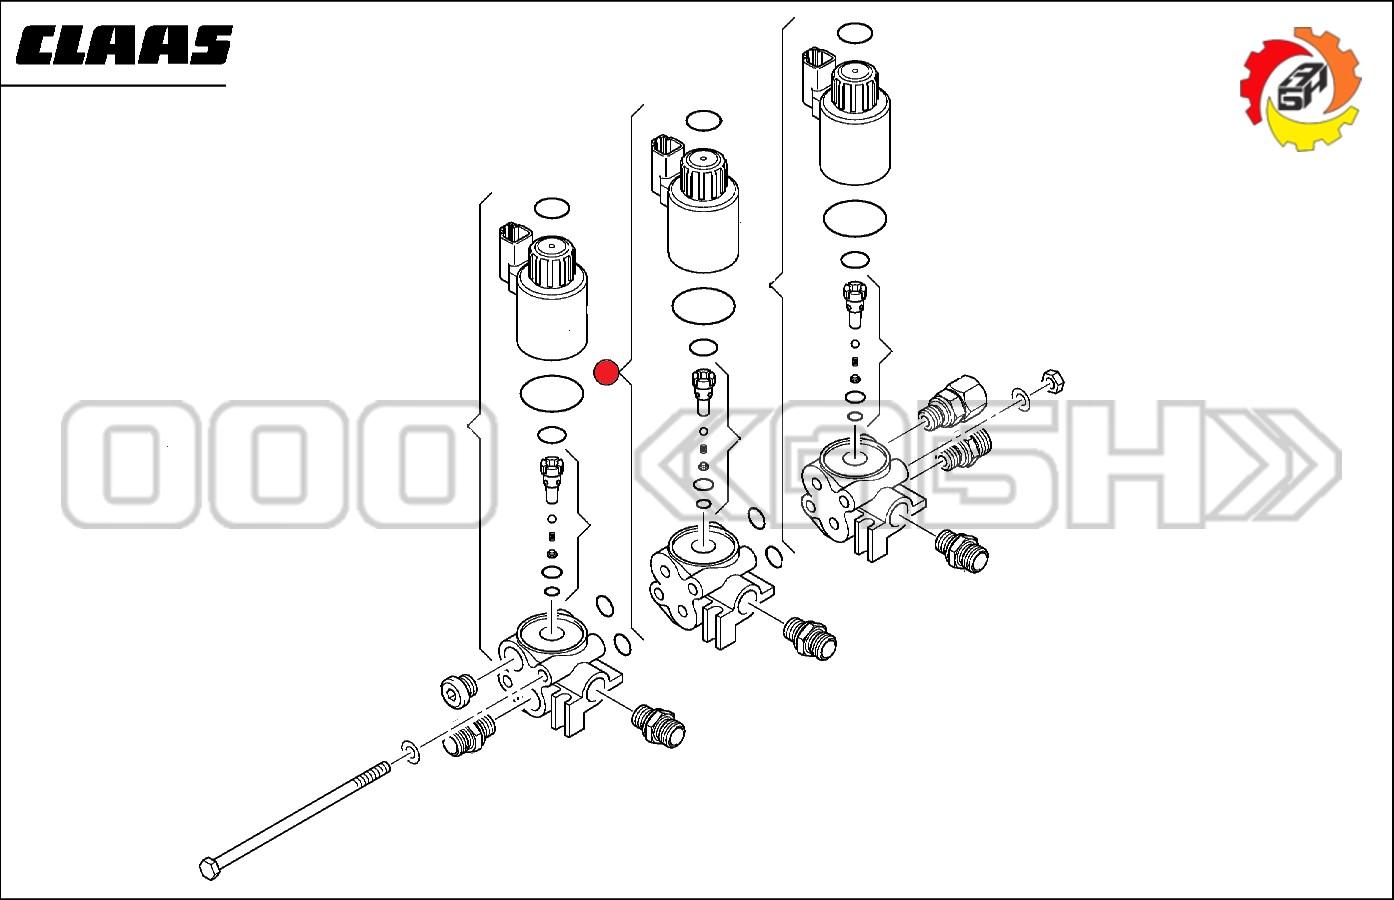 Блок клапанов Claas (0000395790 / 0395790 / 039579.0)